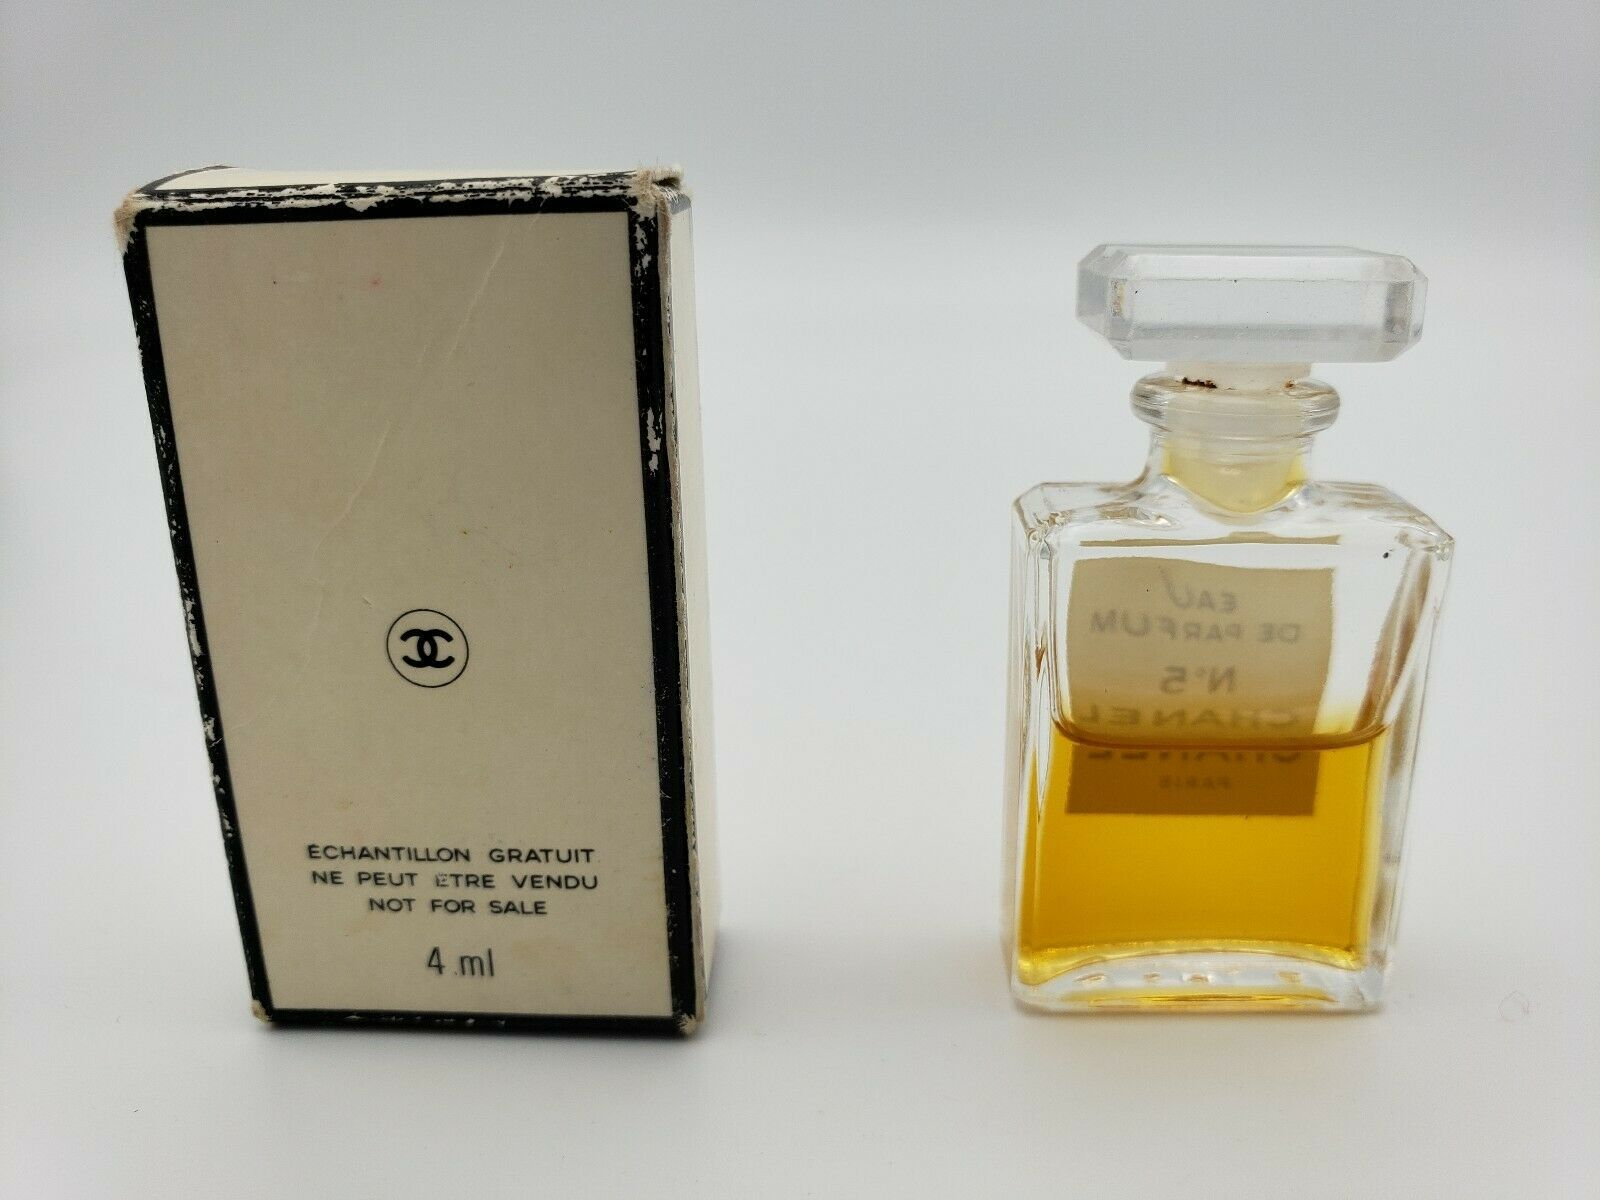 CHANEL NO. 5 Mini Miniature Eau de Parfum 60% Full Perfume .13 Oz w/ Box Vintage image 3